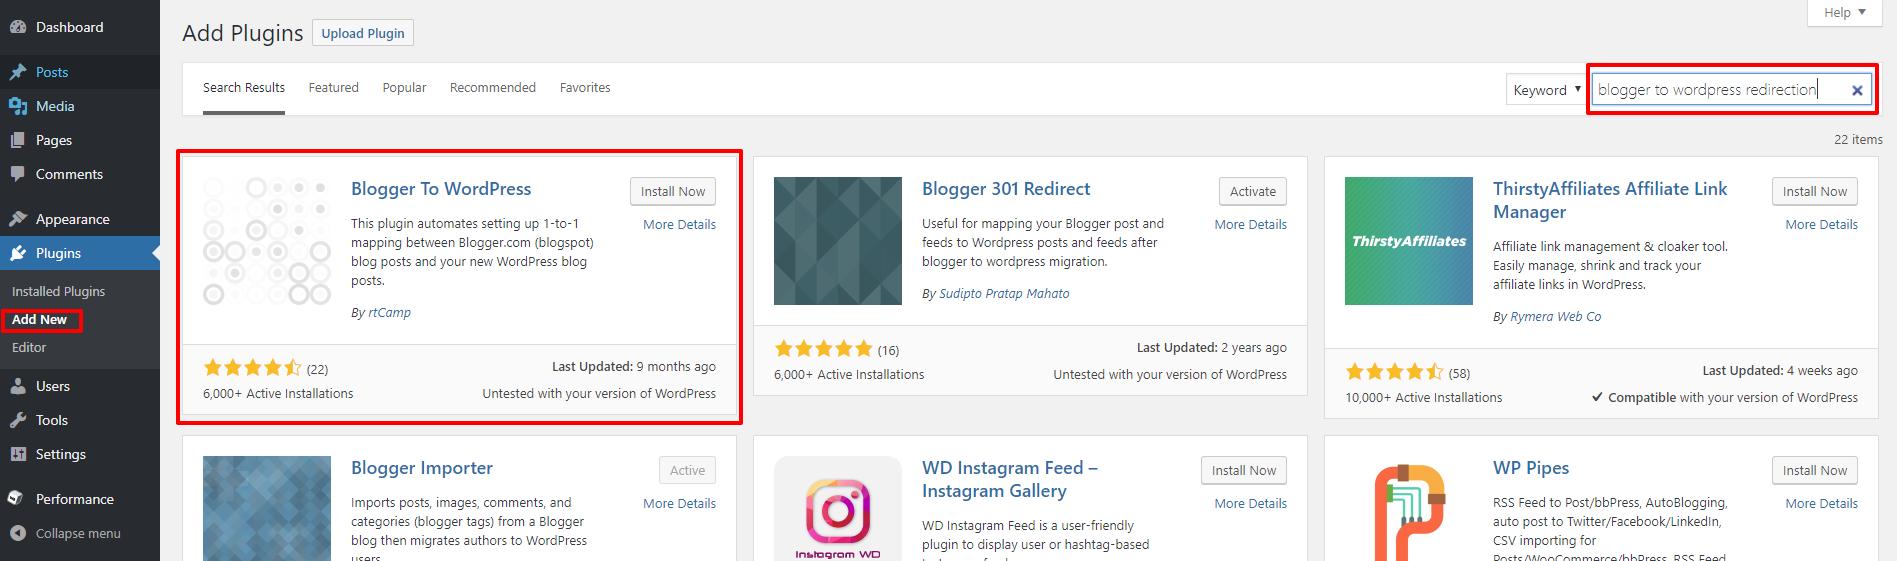 Blogger to WordPress plugin | HollyPryce.com